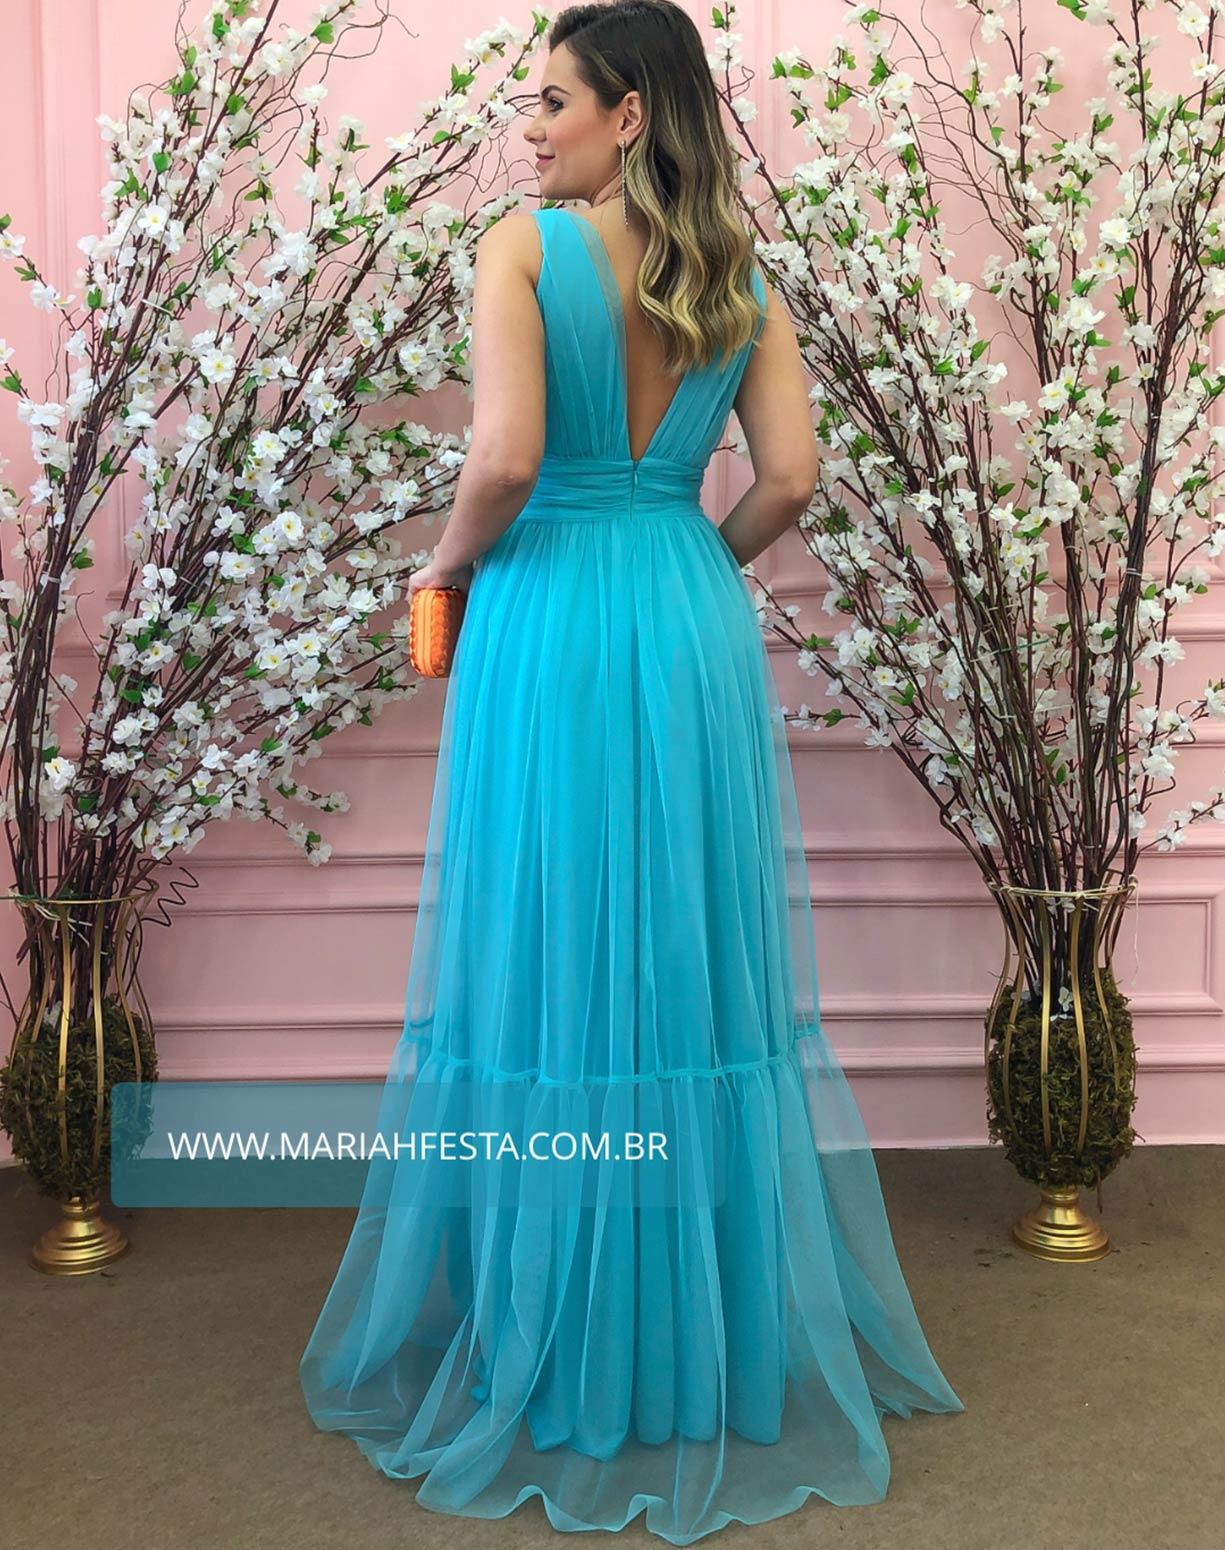 Vestido Tiffany em Tule de Saia Evasê com Fenda